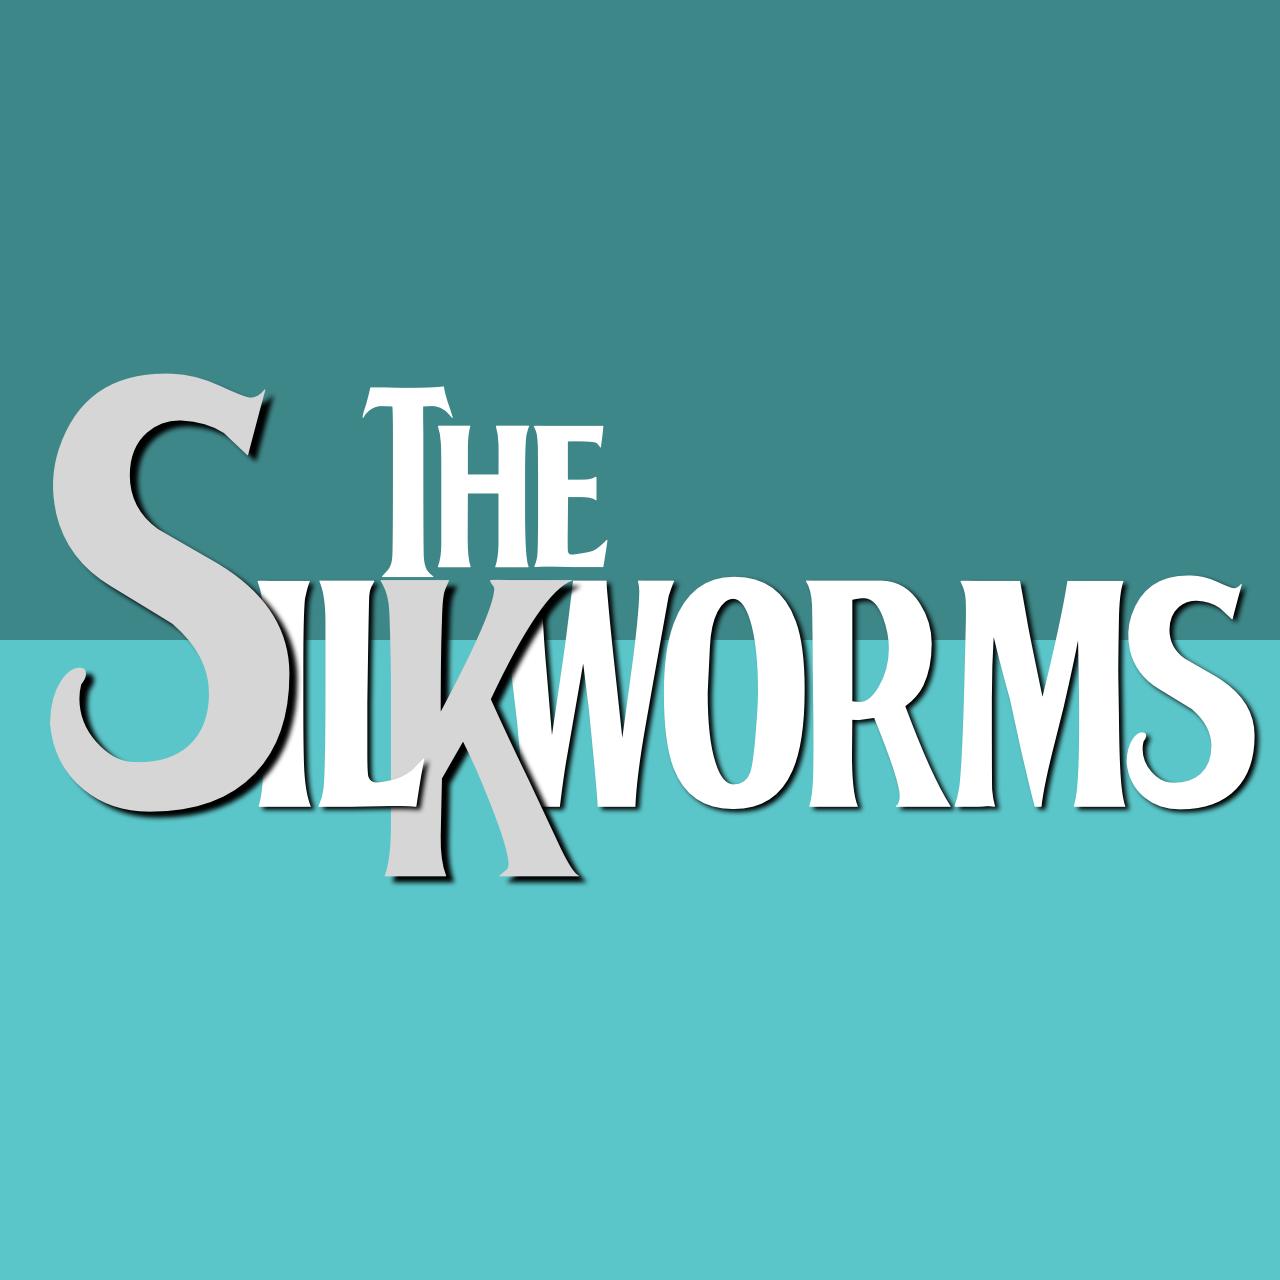 the_silkworms